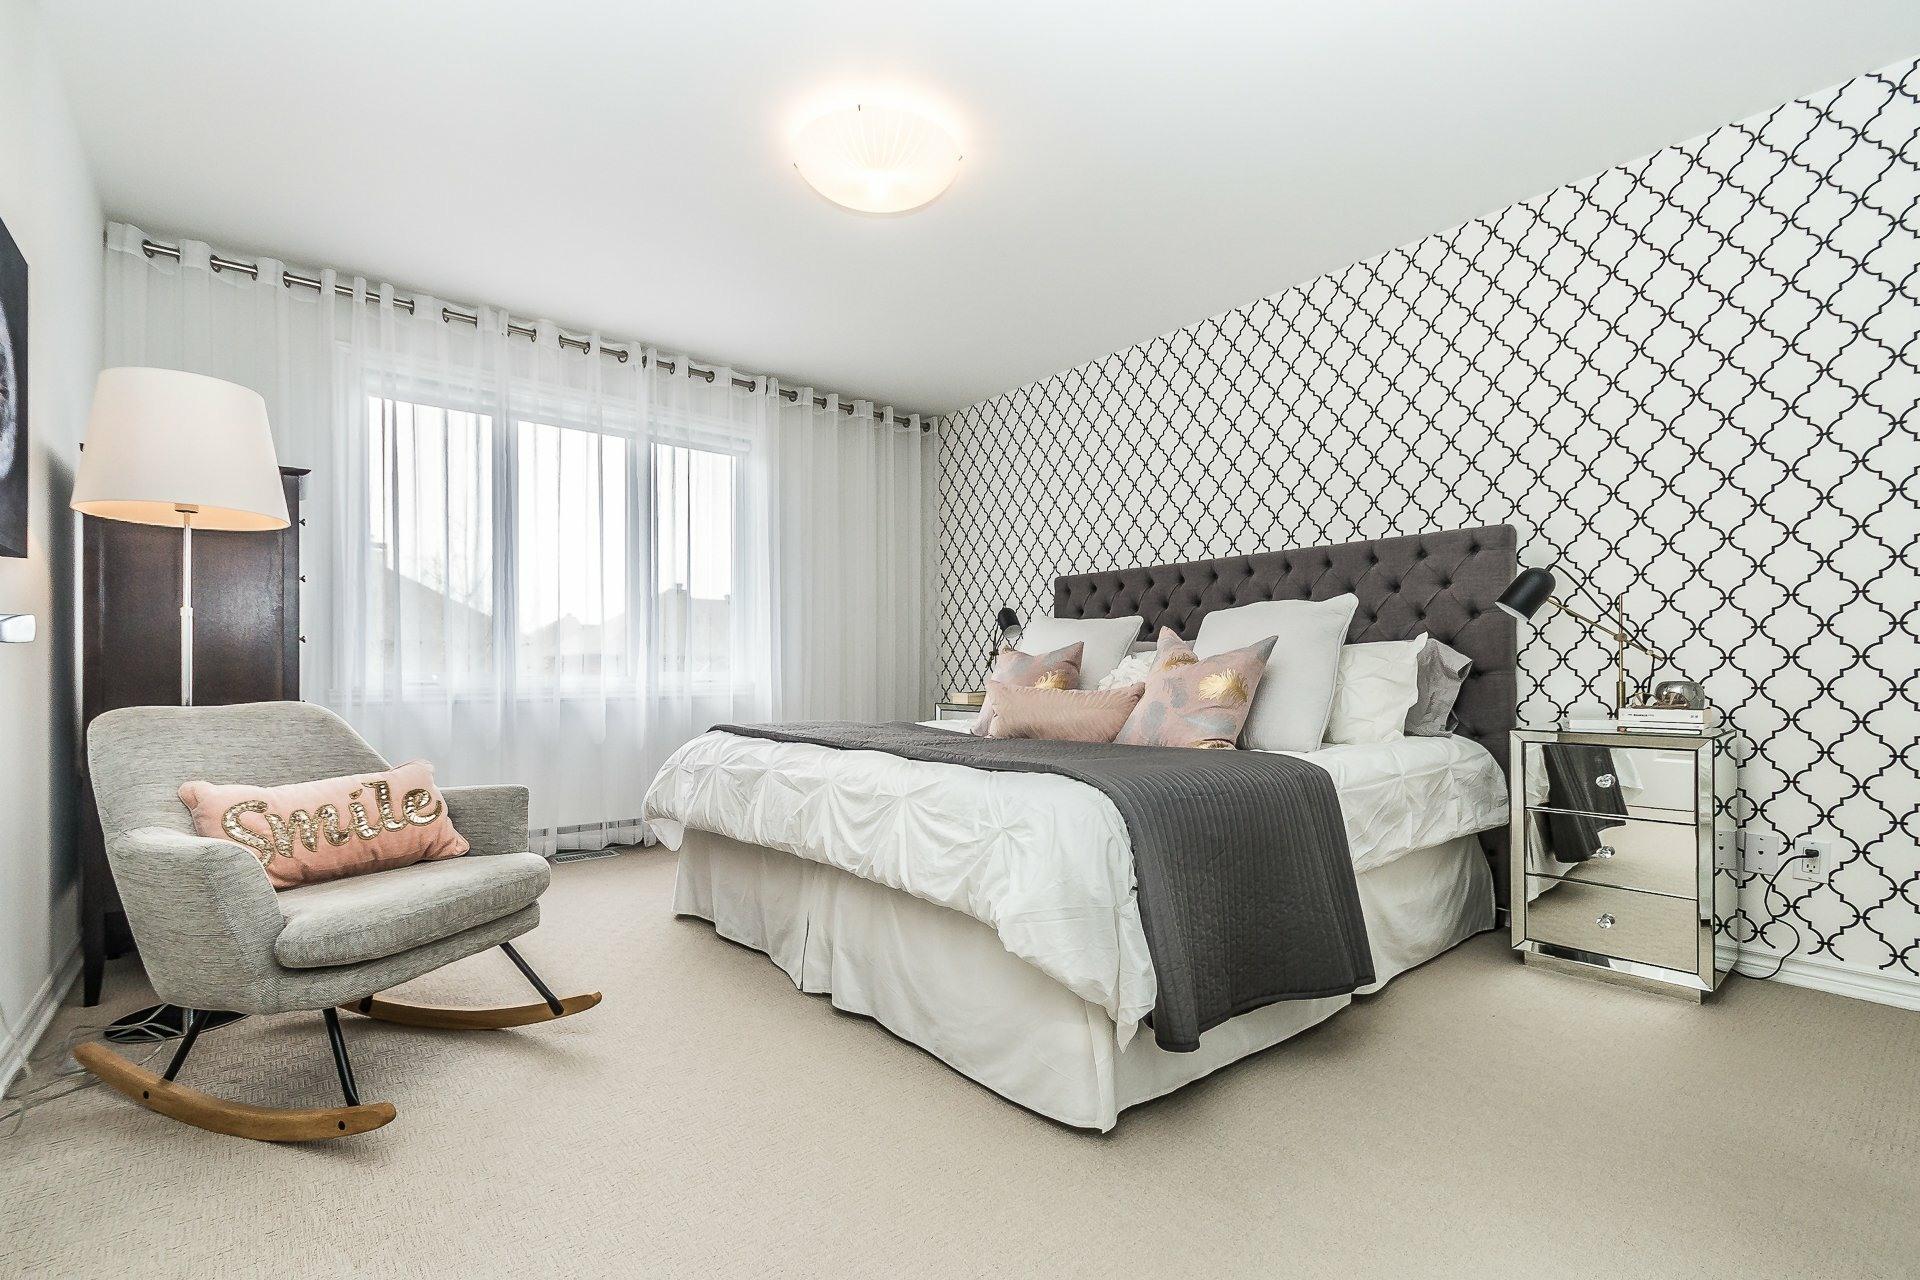 image 11 - MX - Casa sola - MX En venta Montréal Lachine  - 8 habitaciones